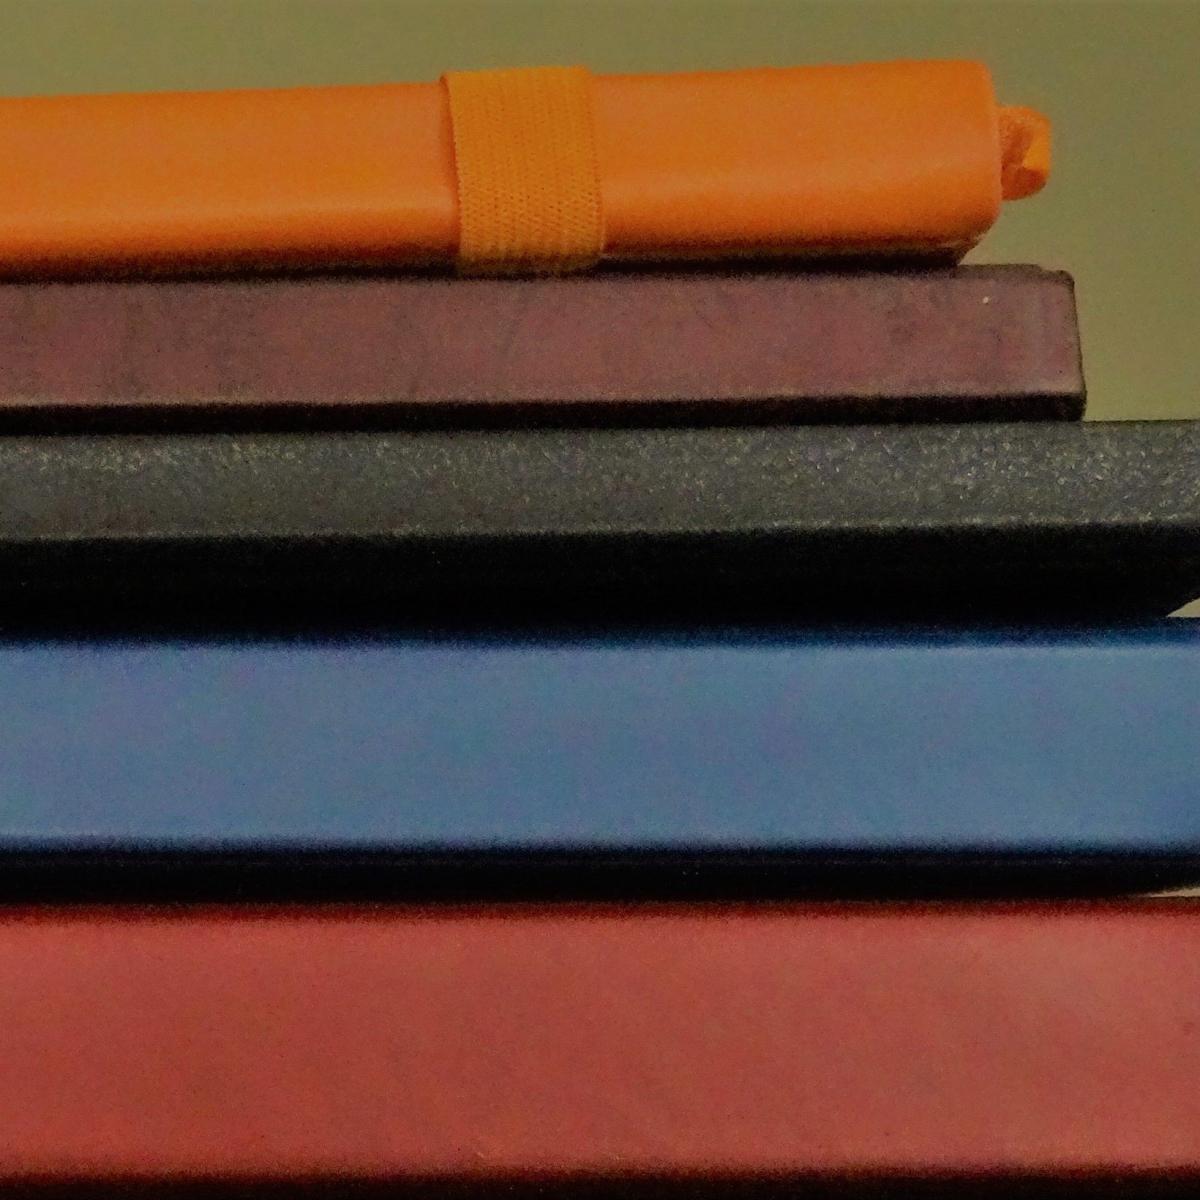 Close-up of multicoloured notebooks arranged like steps.